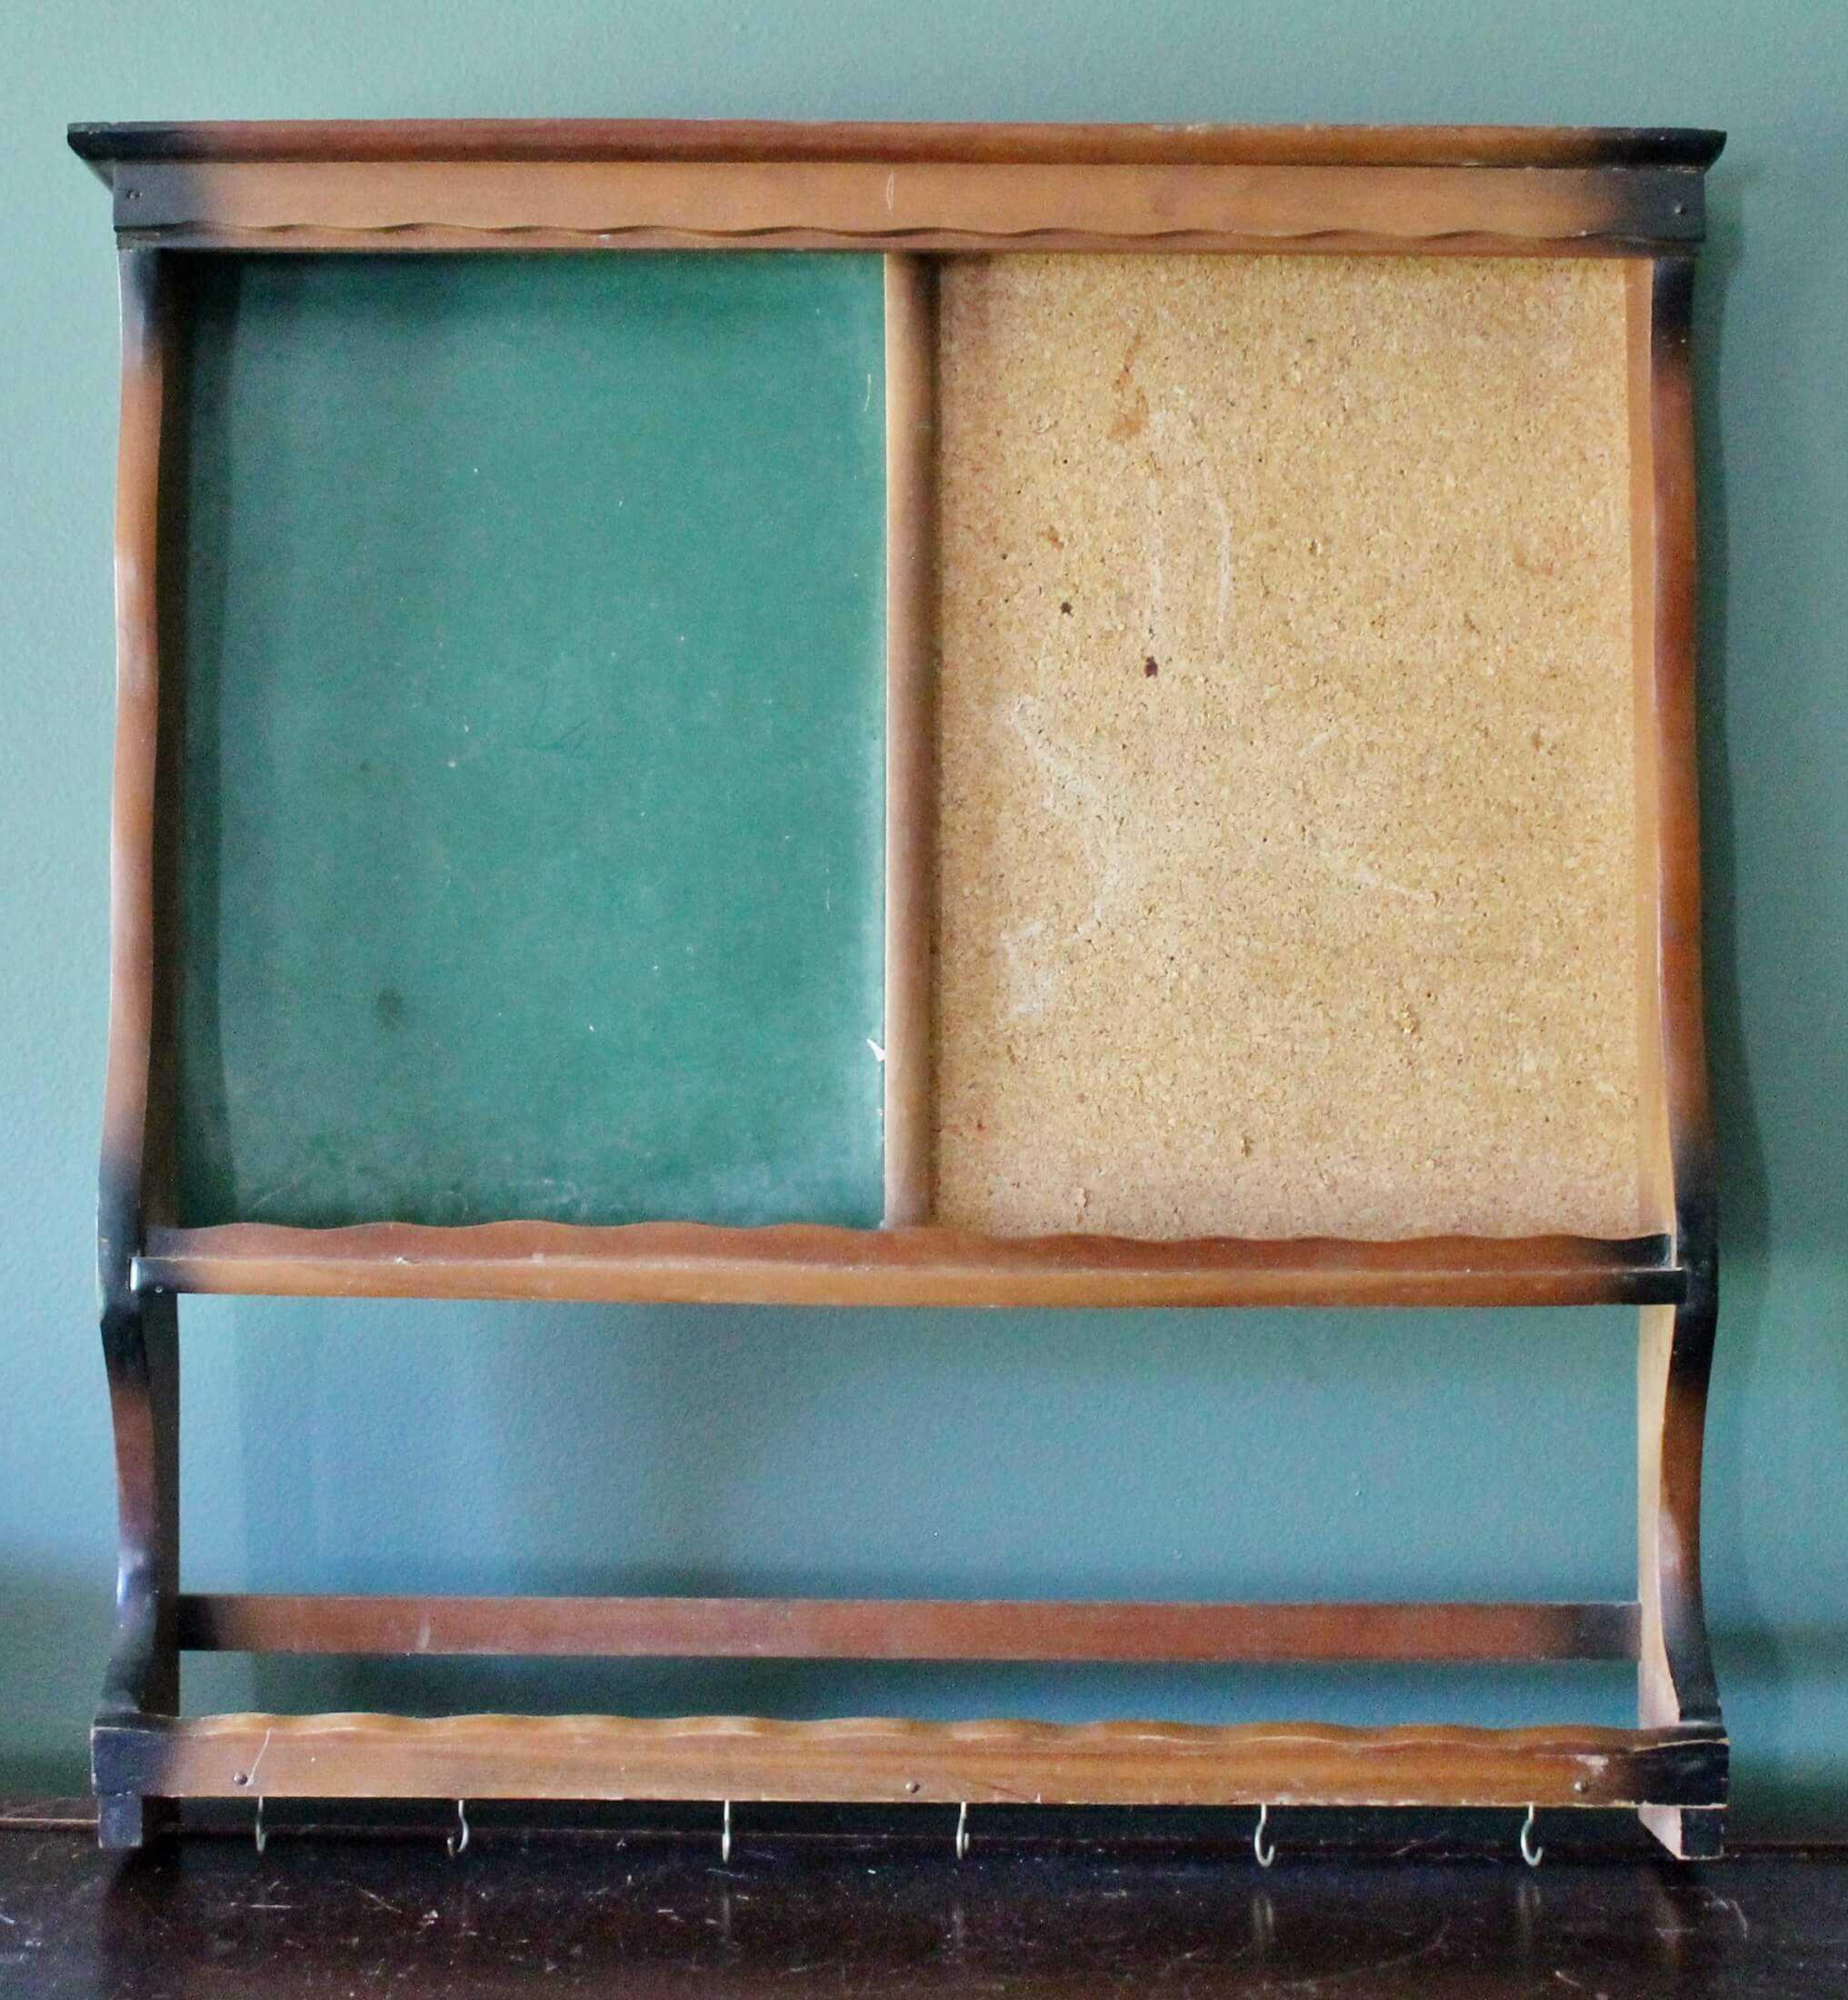 Vintage green chalkboard and bulletin board